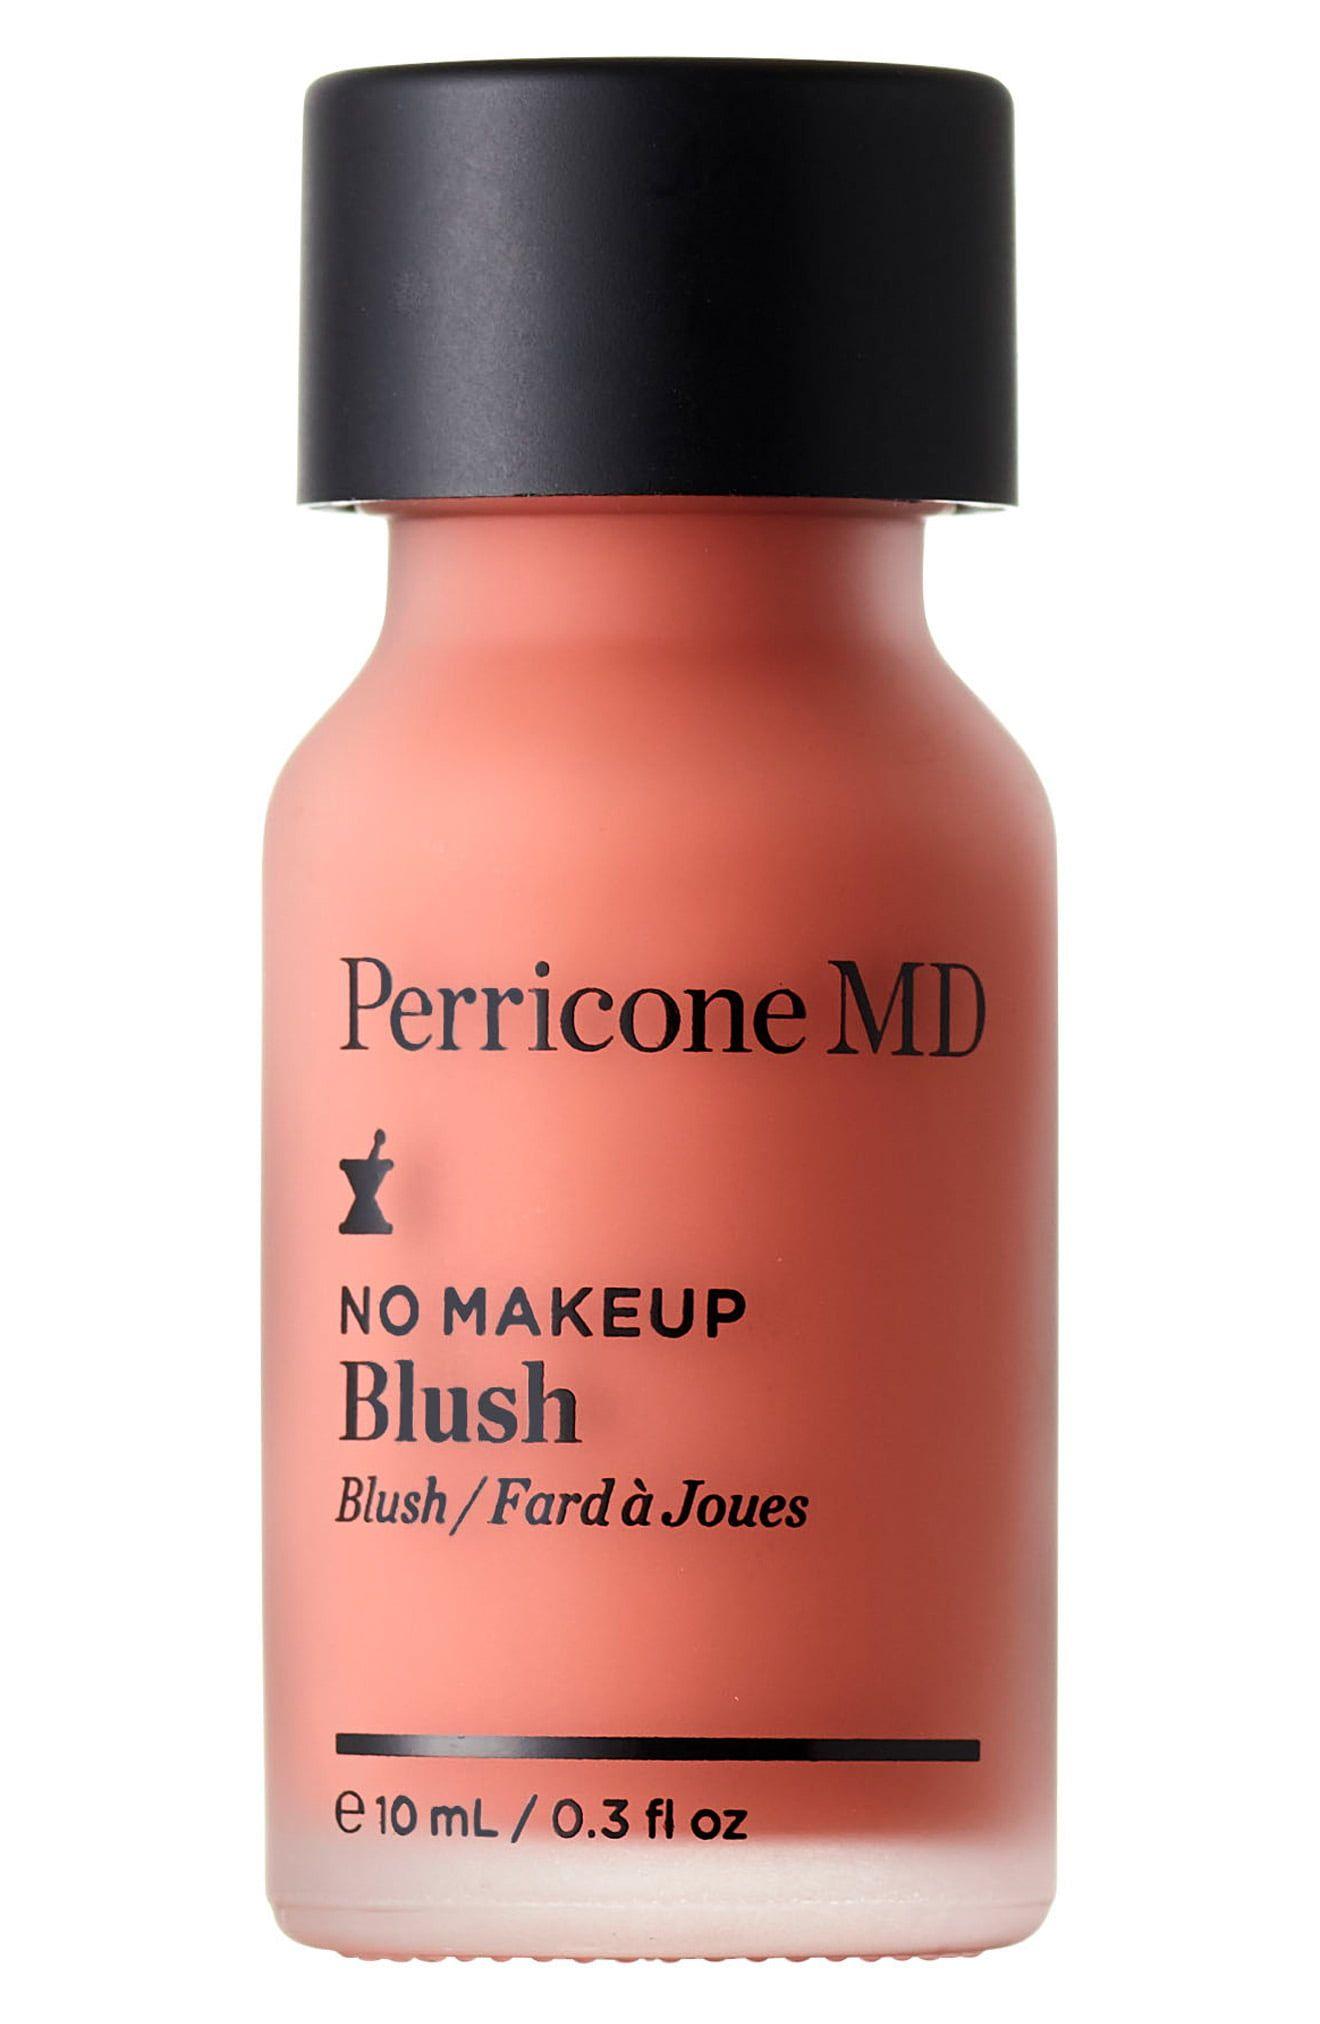 Perricone Md No Makeup Blush No Color Blush makeup